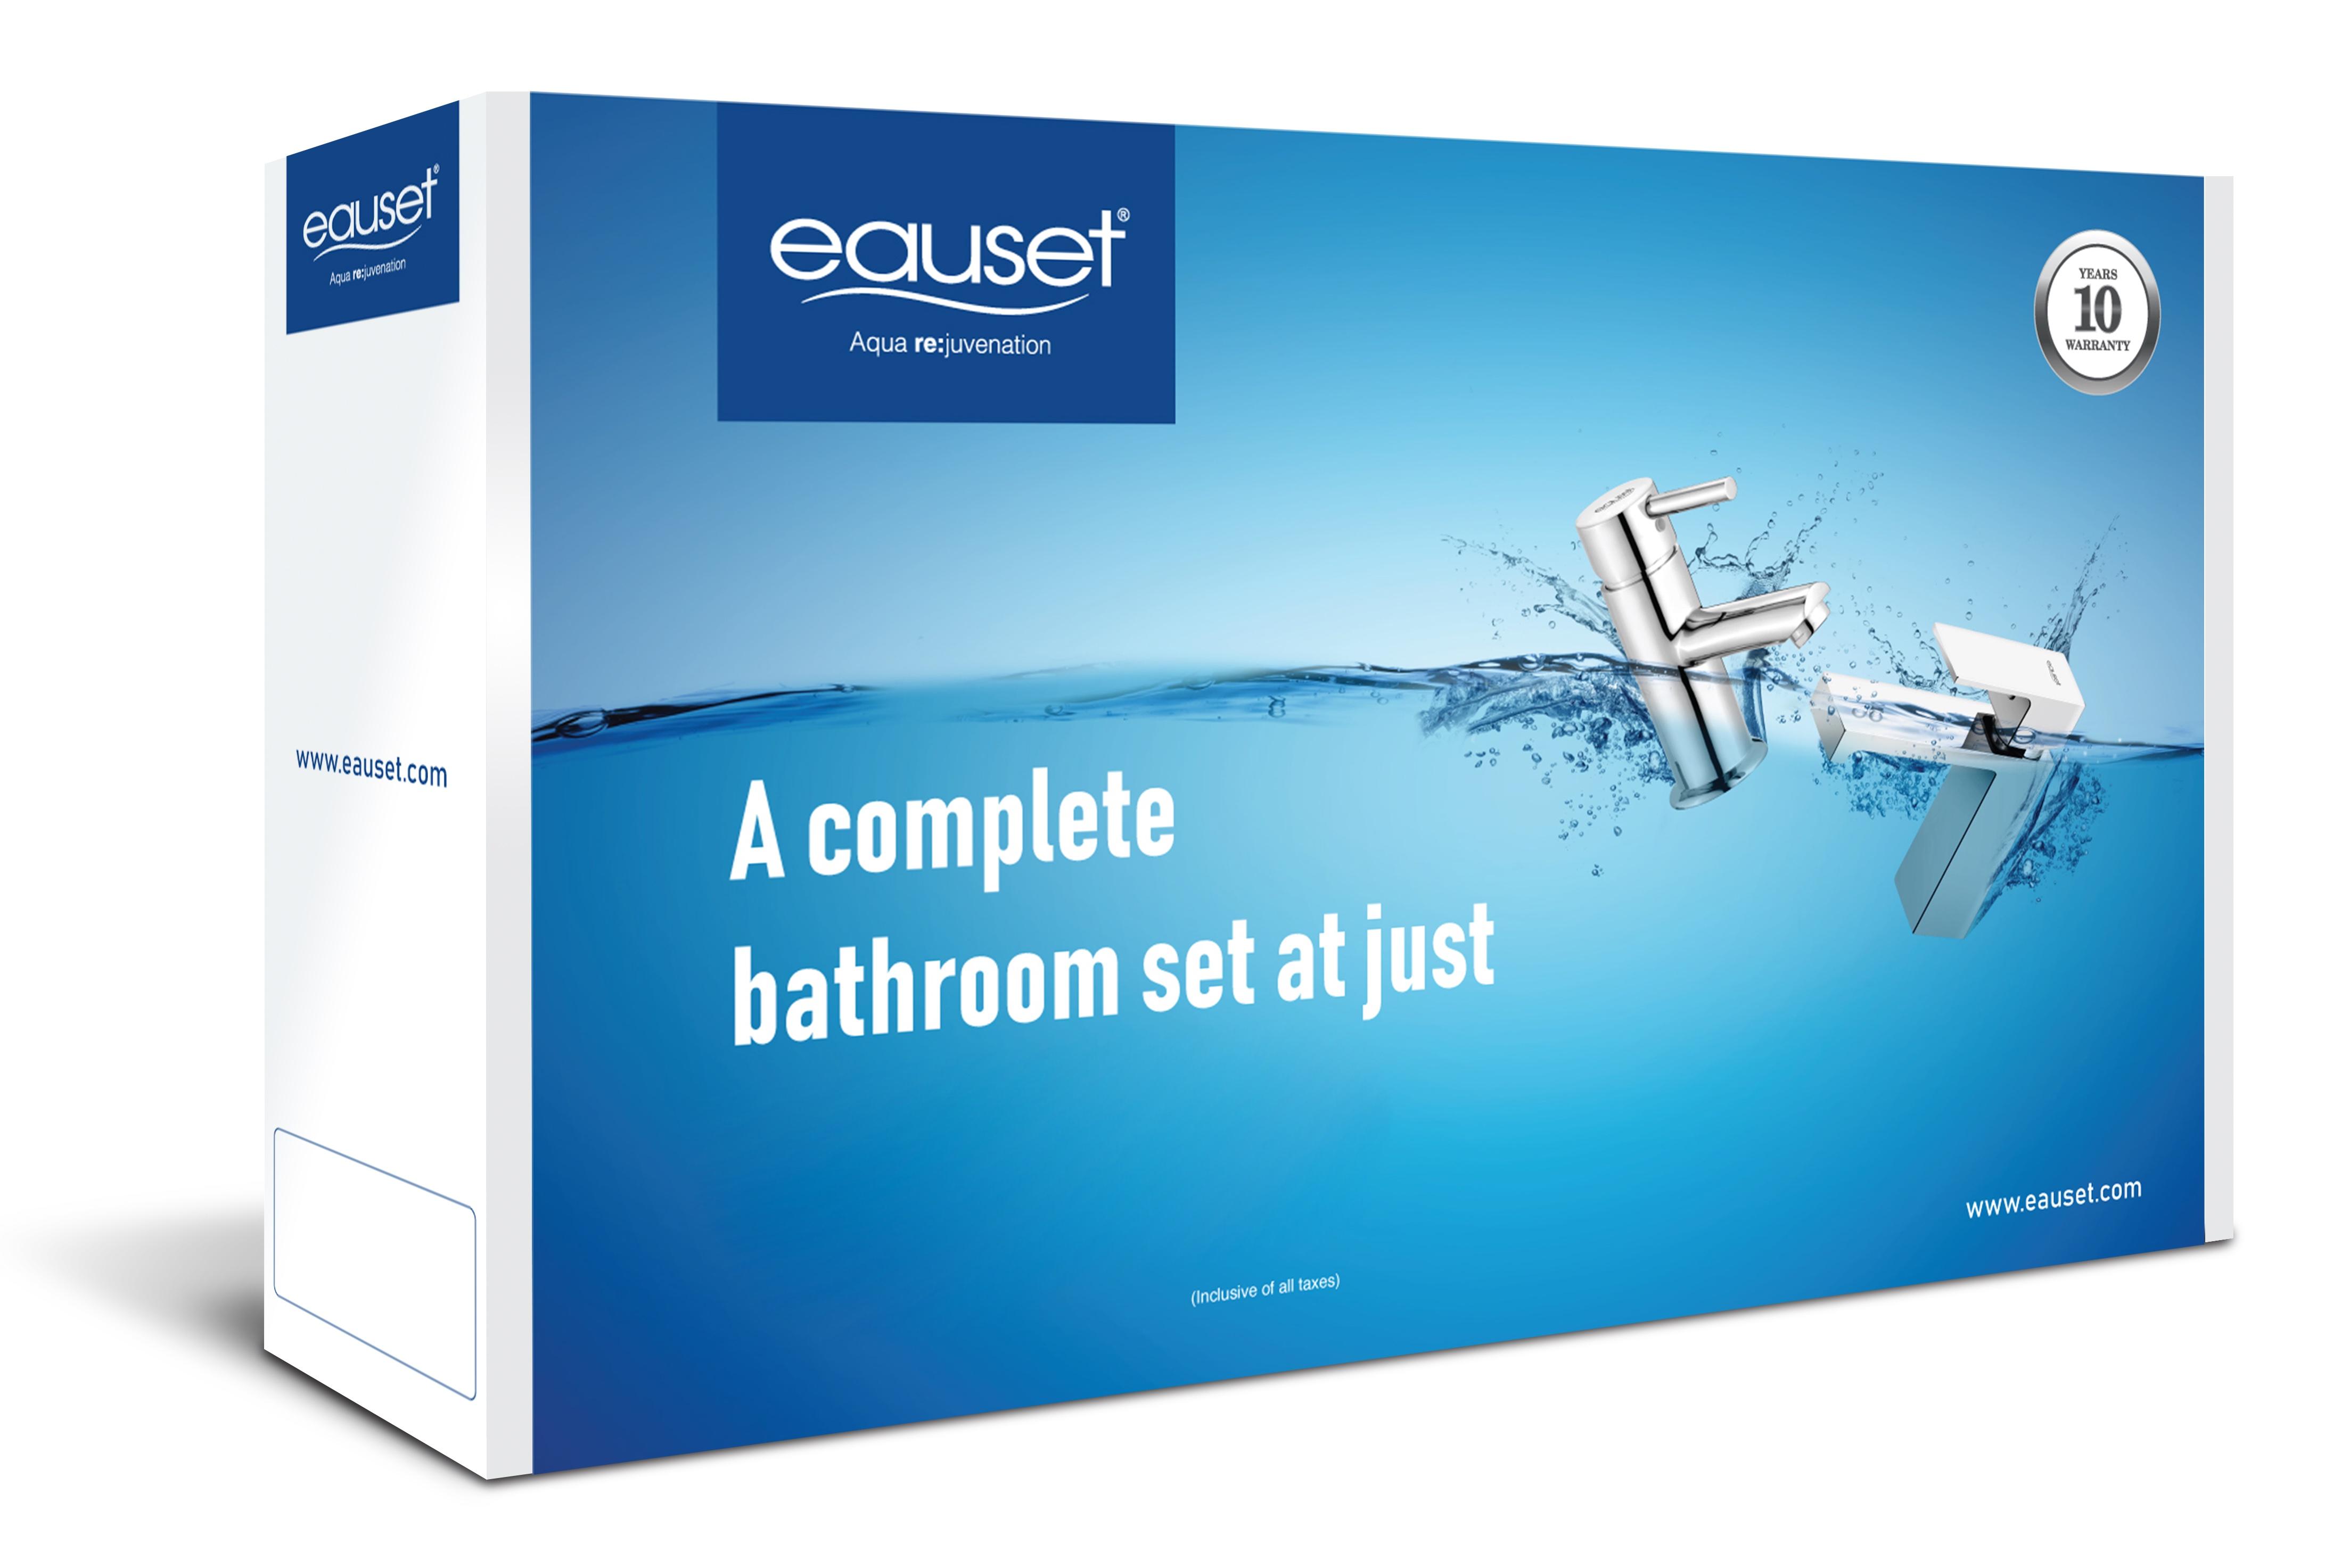 Bath Set - Single Lever Basin Mixer + Bath Tub Spout + Single Lever Cons Divertor ( High Flow ) With Upper Part + Angle Cock- 03 Pcs + Shower With Arm